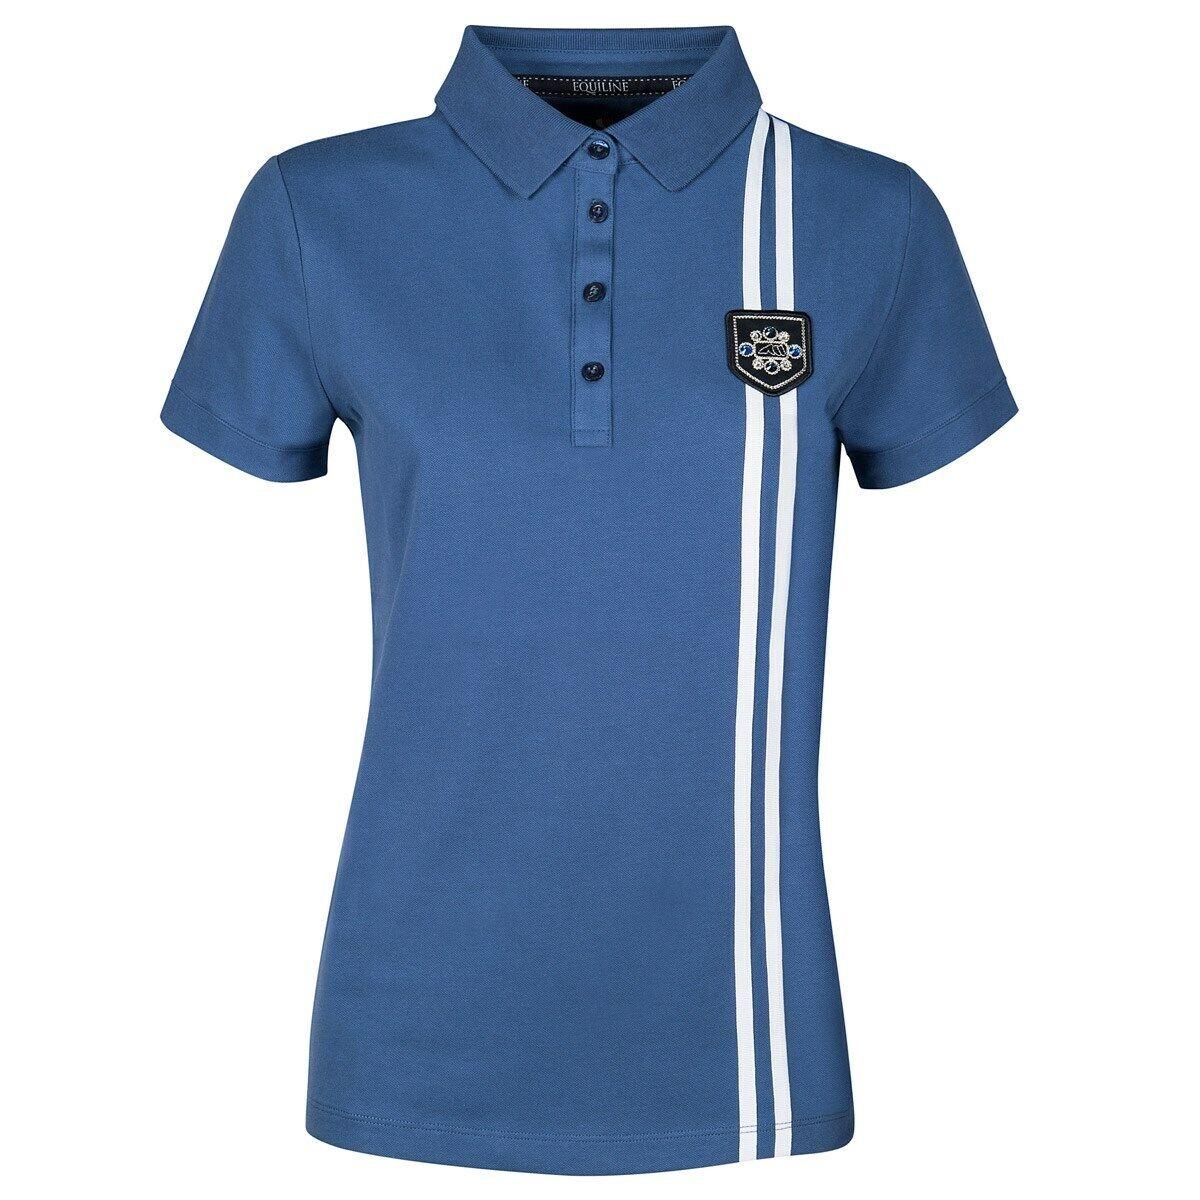 Equiline Royal Polo Shirt Top ladies short sleeve niagara bluee size S + M